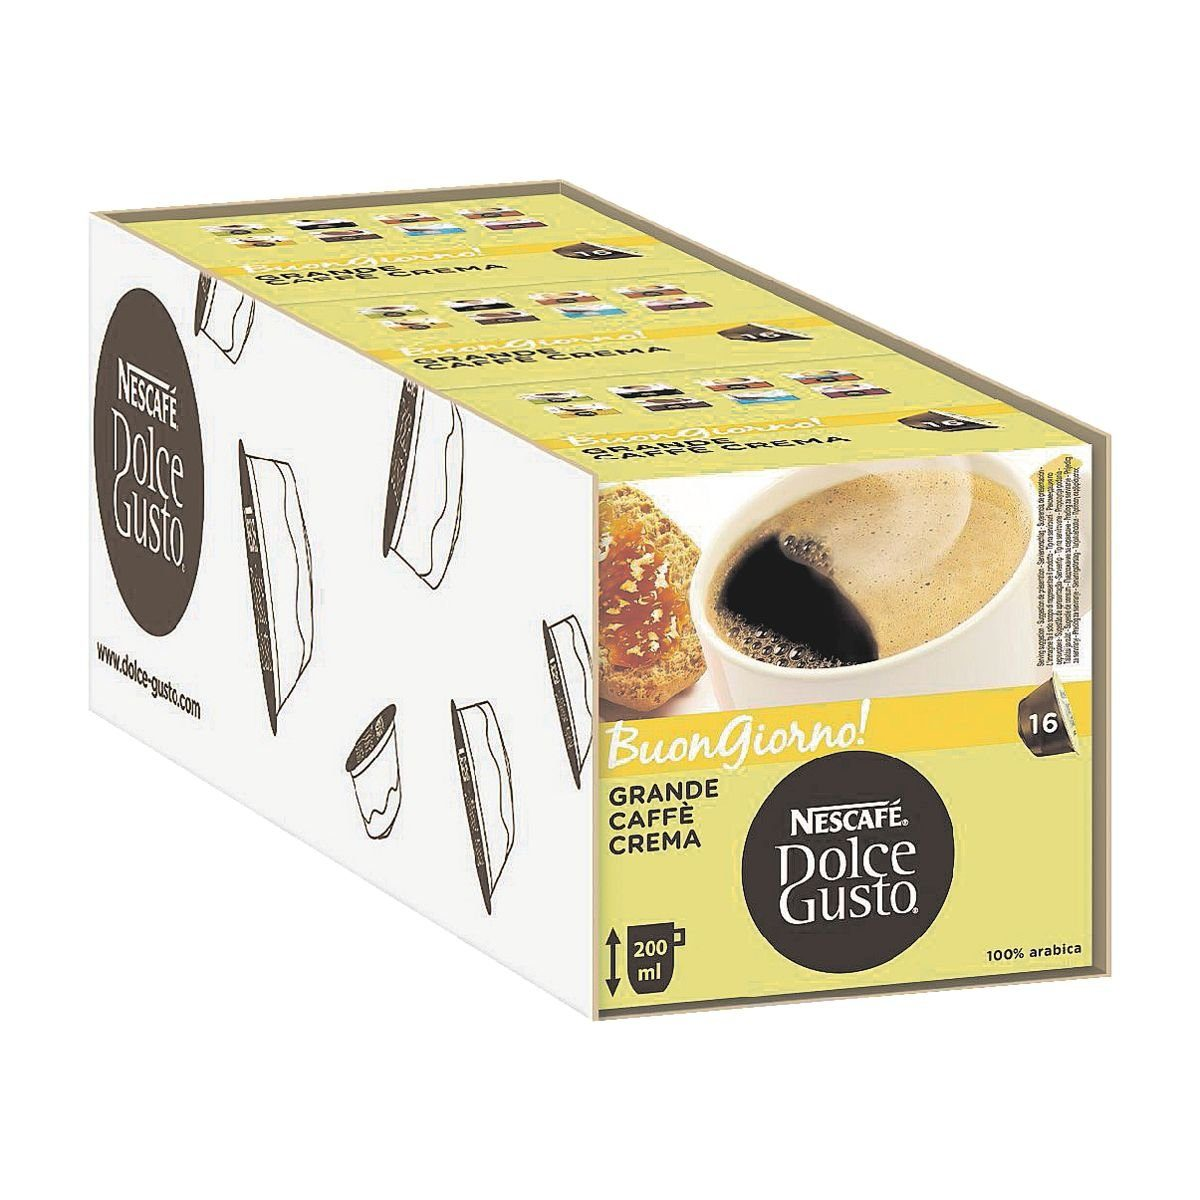 NESCAFE 3x Kaffeekapseln »Dolce Gusto Grande Caffè Crema...